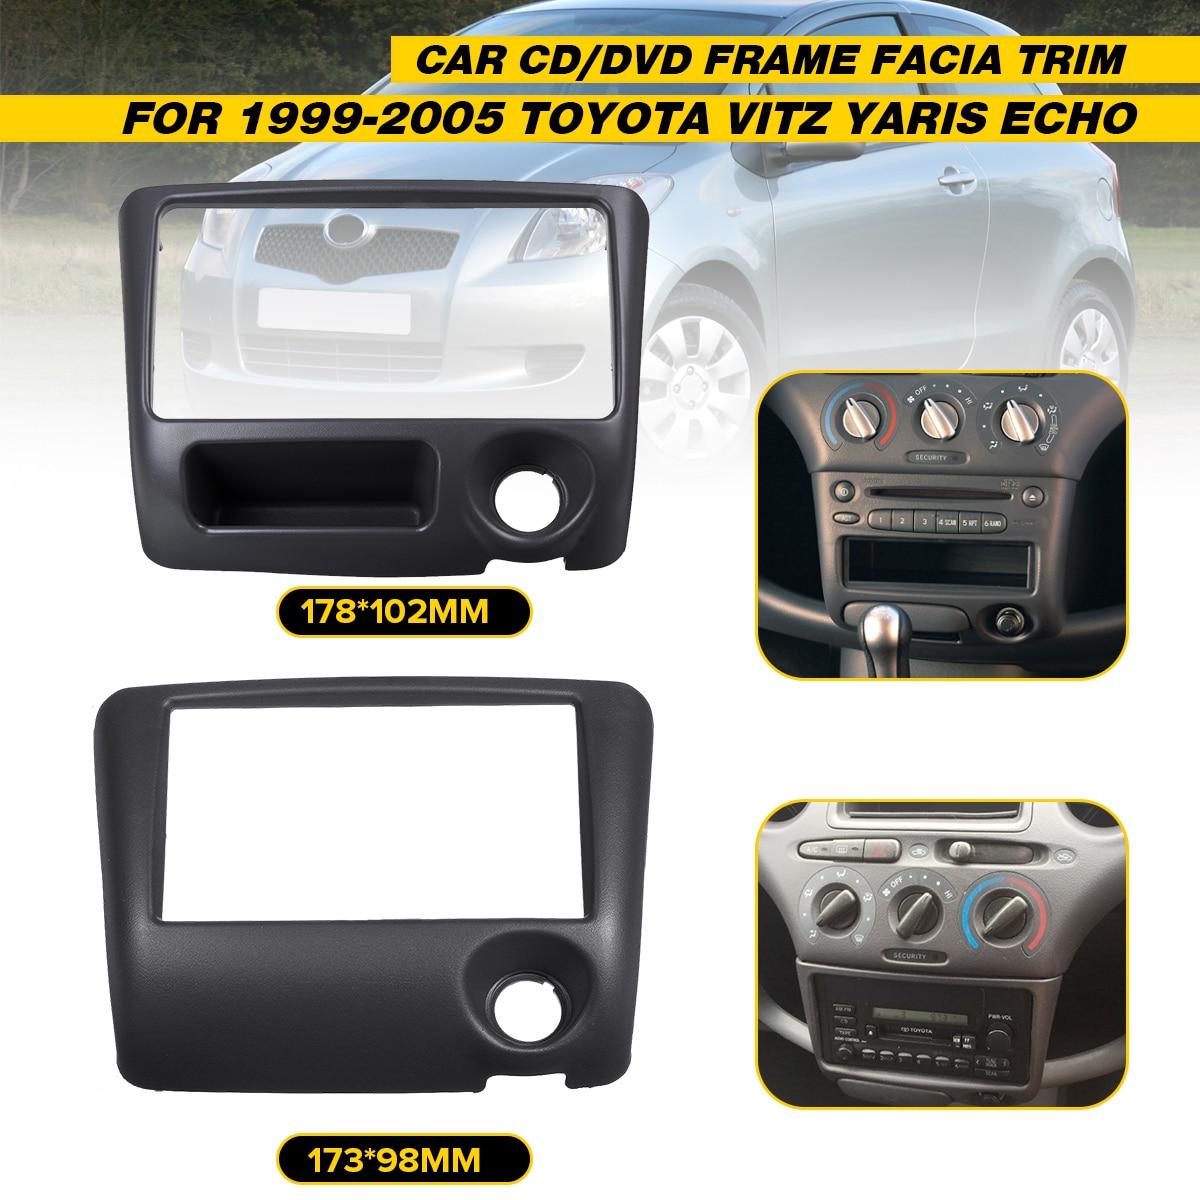 2 DIN Car Radio Facia for Toyota Yaris for Echo Vitz 1999 2000 2005 DVD Stereo CD Panel Dash Kit Trim Fascia Face Plate Console|Fascias| |  - title=